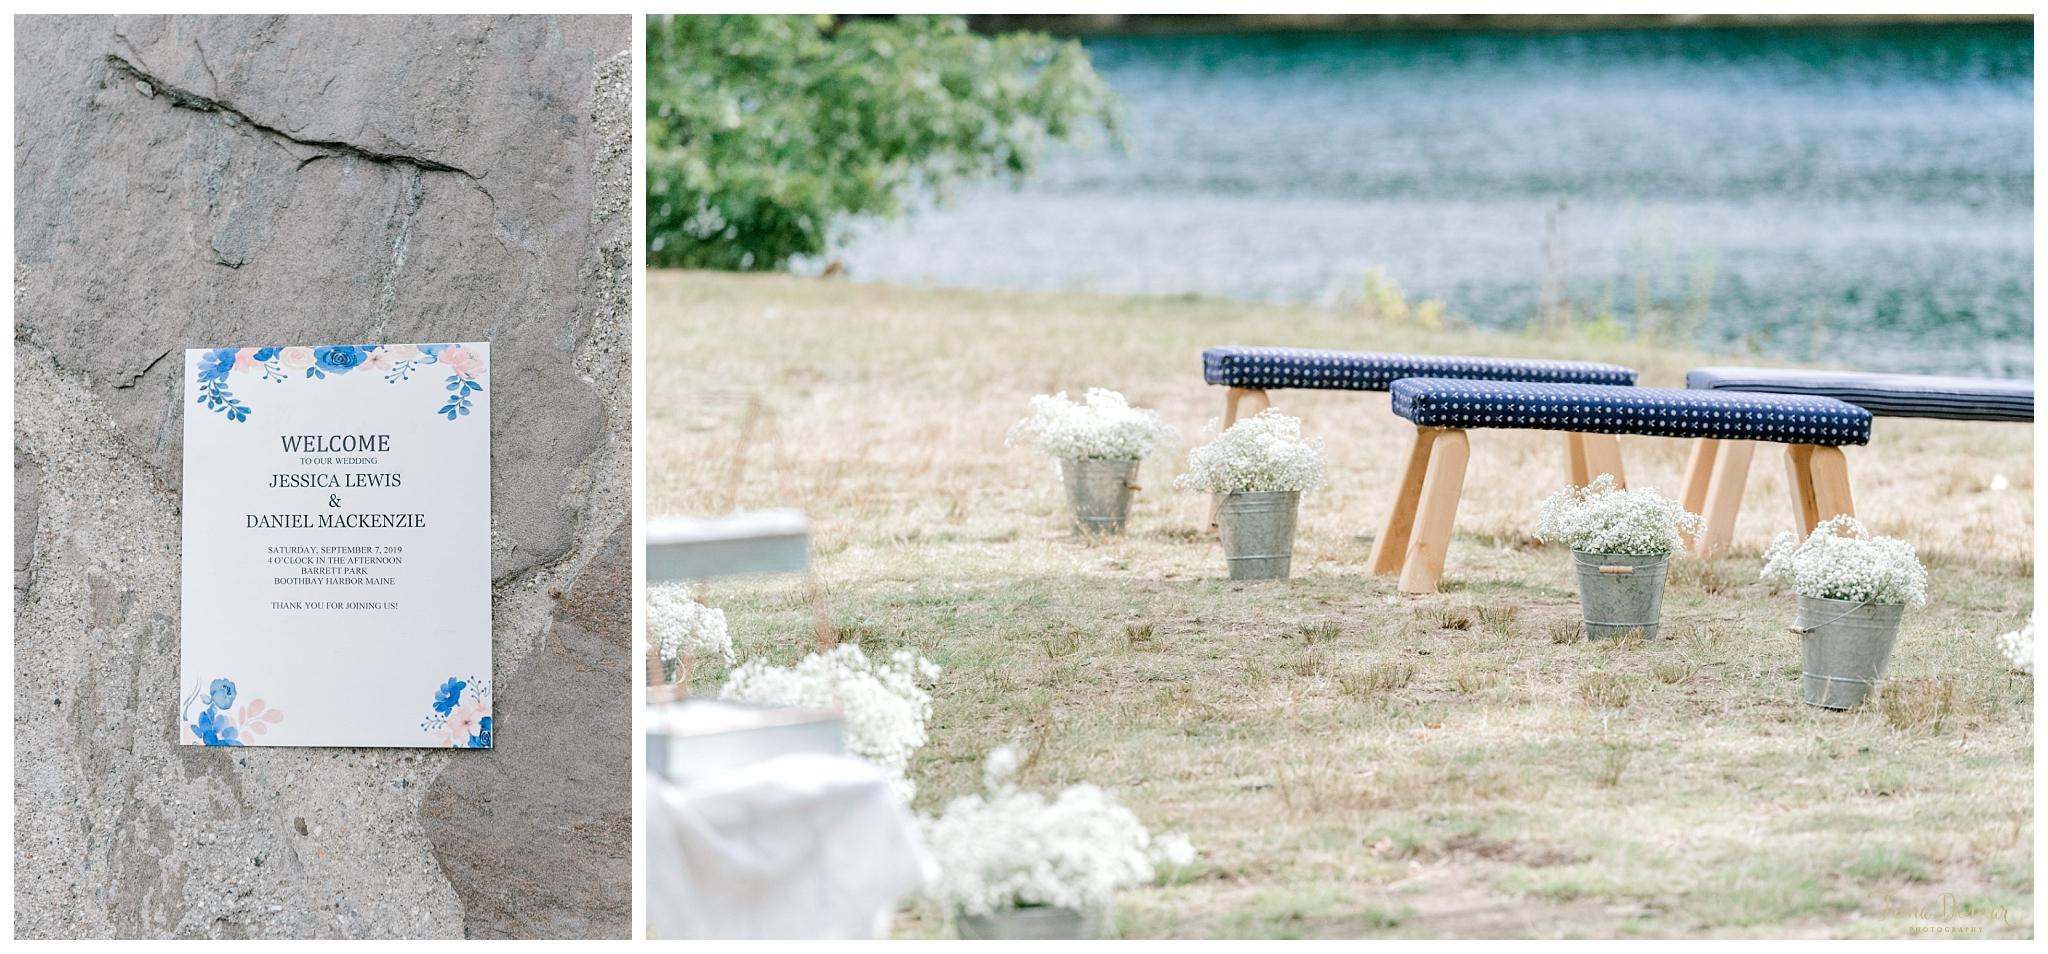 Boothbay Harbor Barrett Park Wedding Ceremony